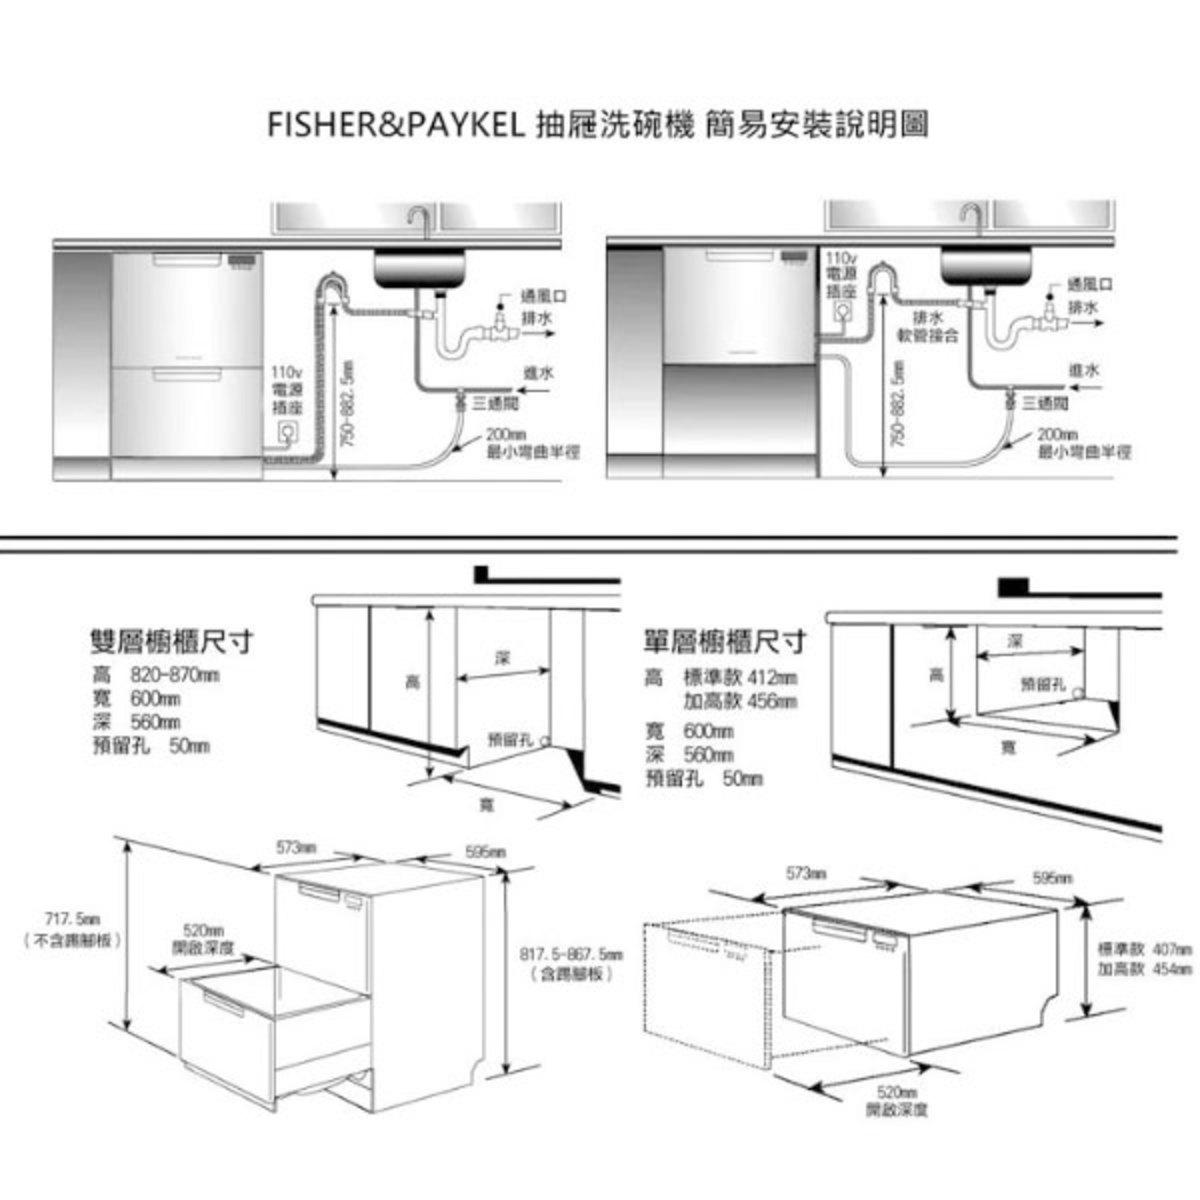 Fisher&Paykel DD60DCHX9 雙層抽屜式洗碗機 9系列 14人份 不銹鋼